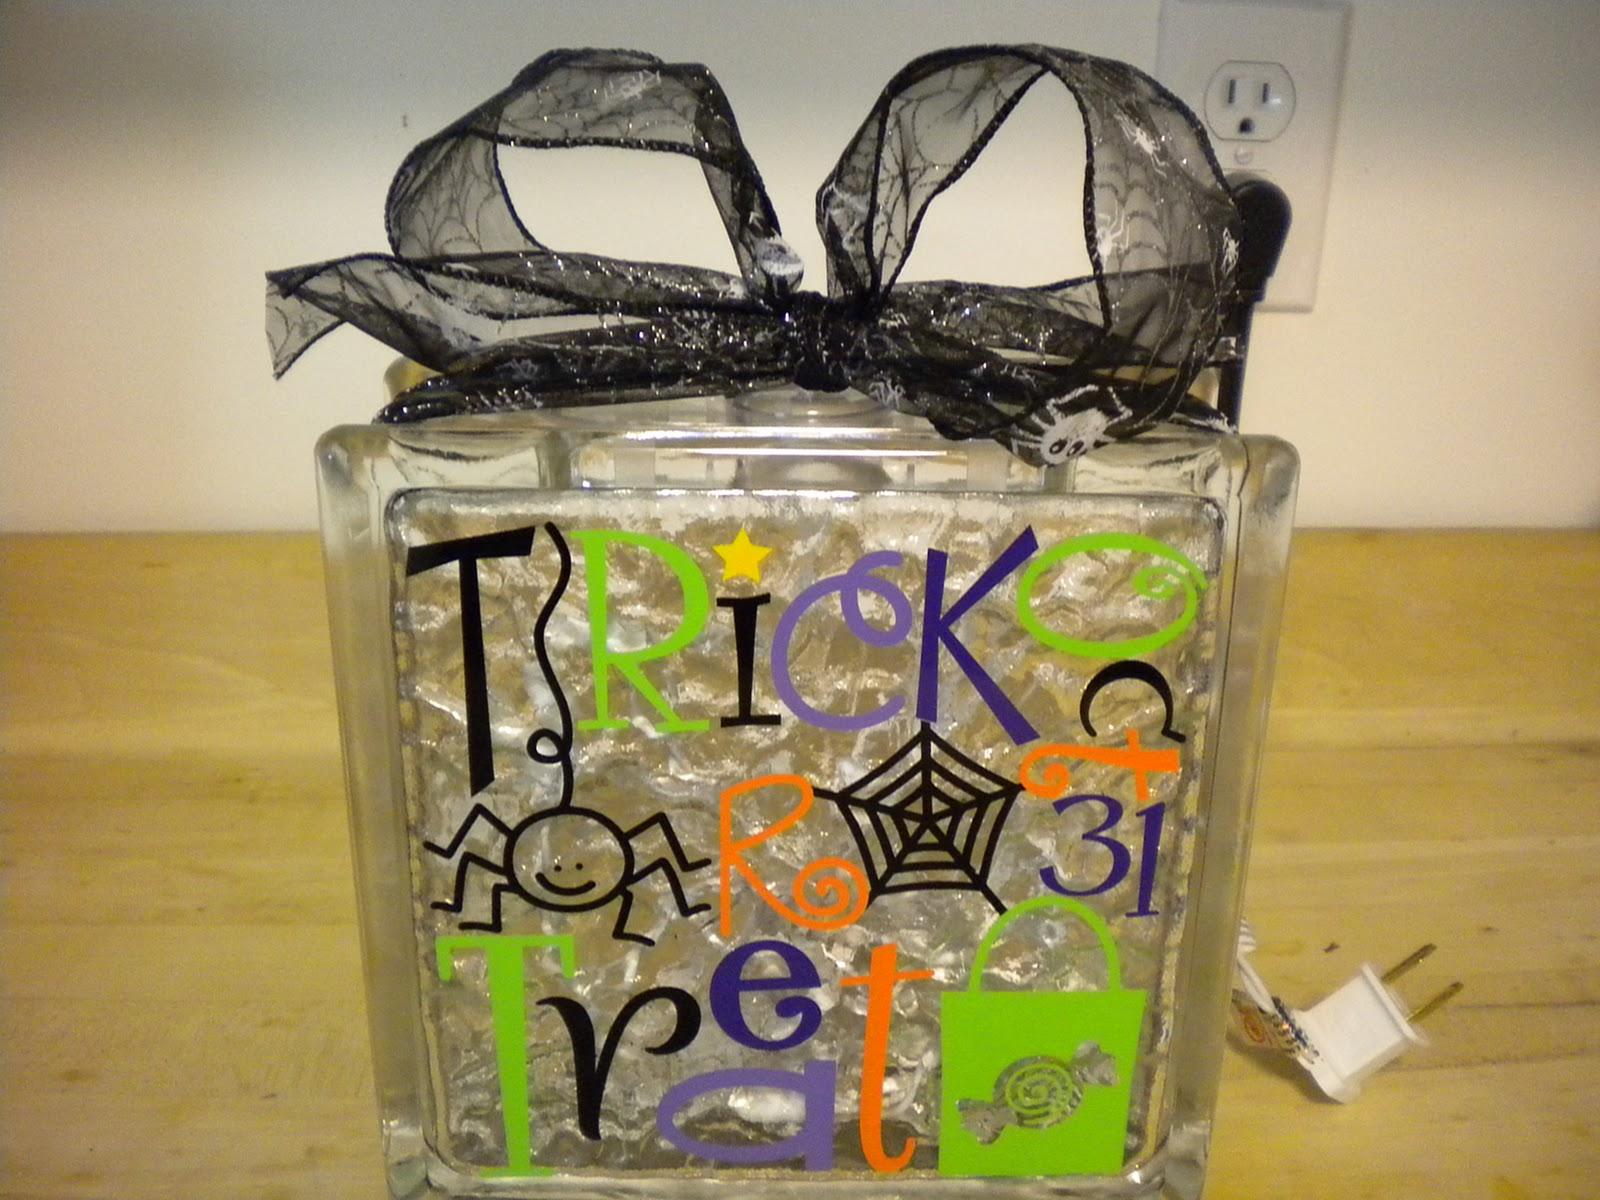 Dragonfly creative halloween glass block decorations - Glass block decoration ideas ...